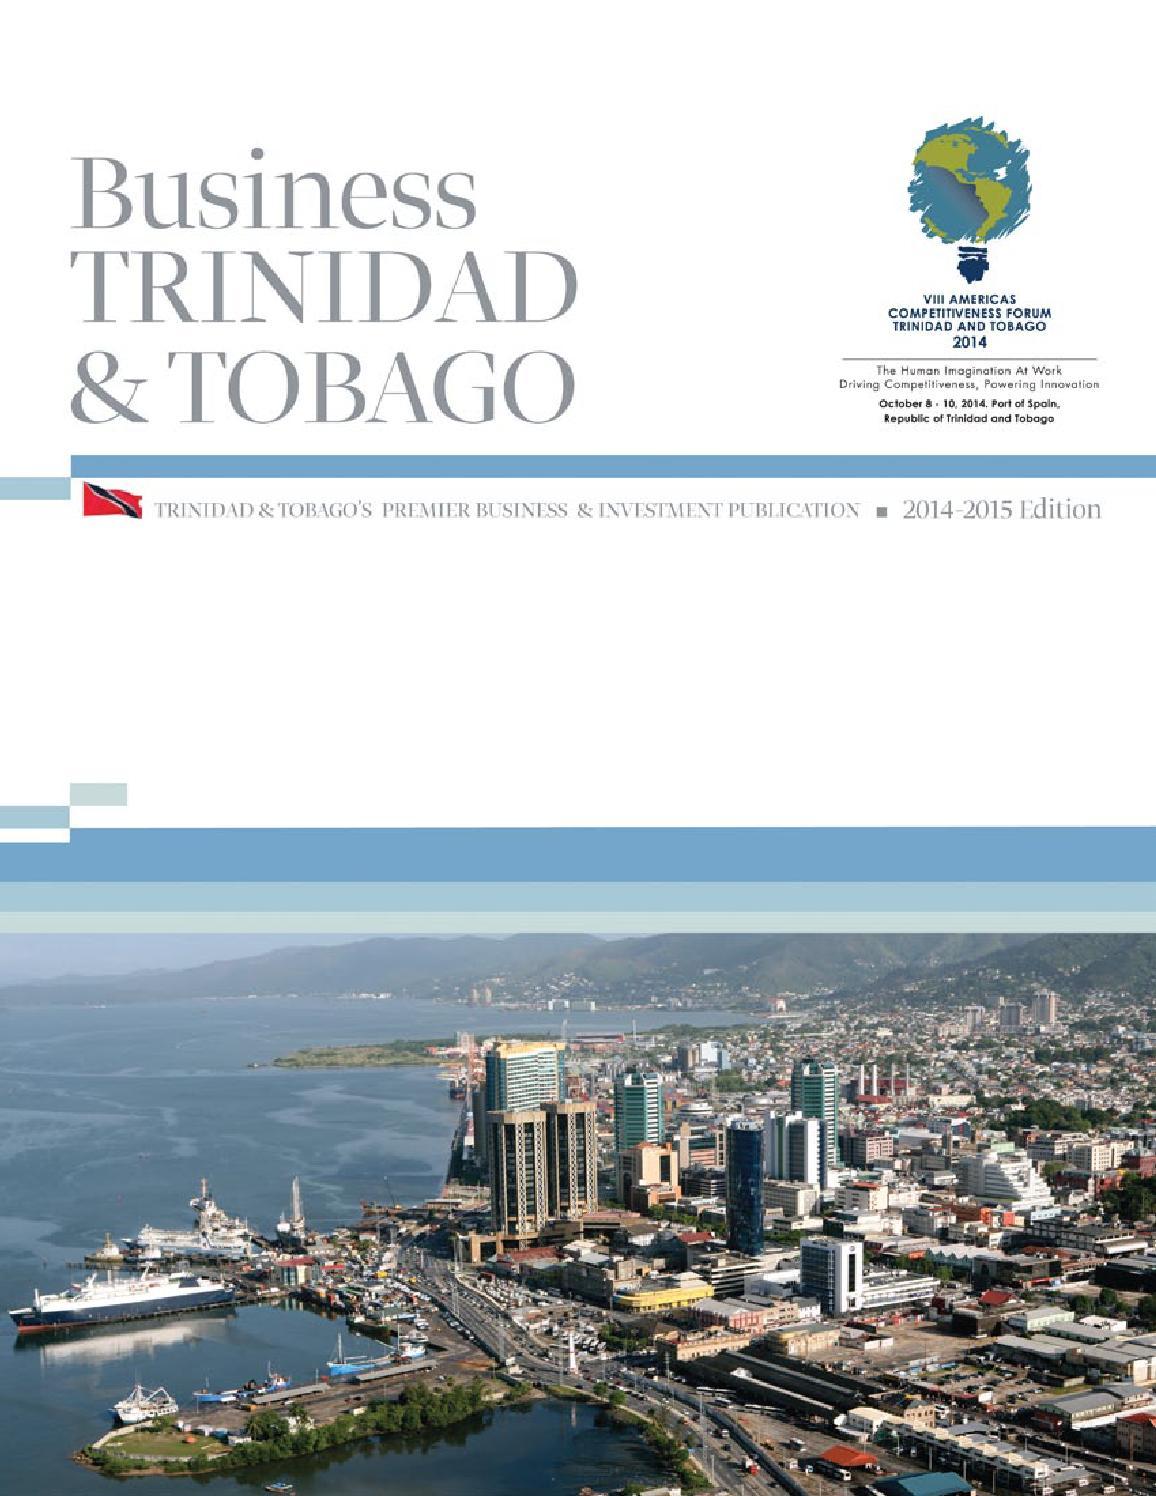 life in trinidad and tobago essay Explore monica gomez's board trinidad pride on about trinidad and tobago, island life and sigmund freud trauer und melancholy essays on the great essay.